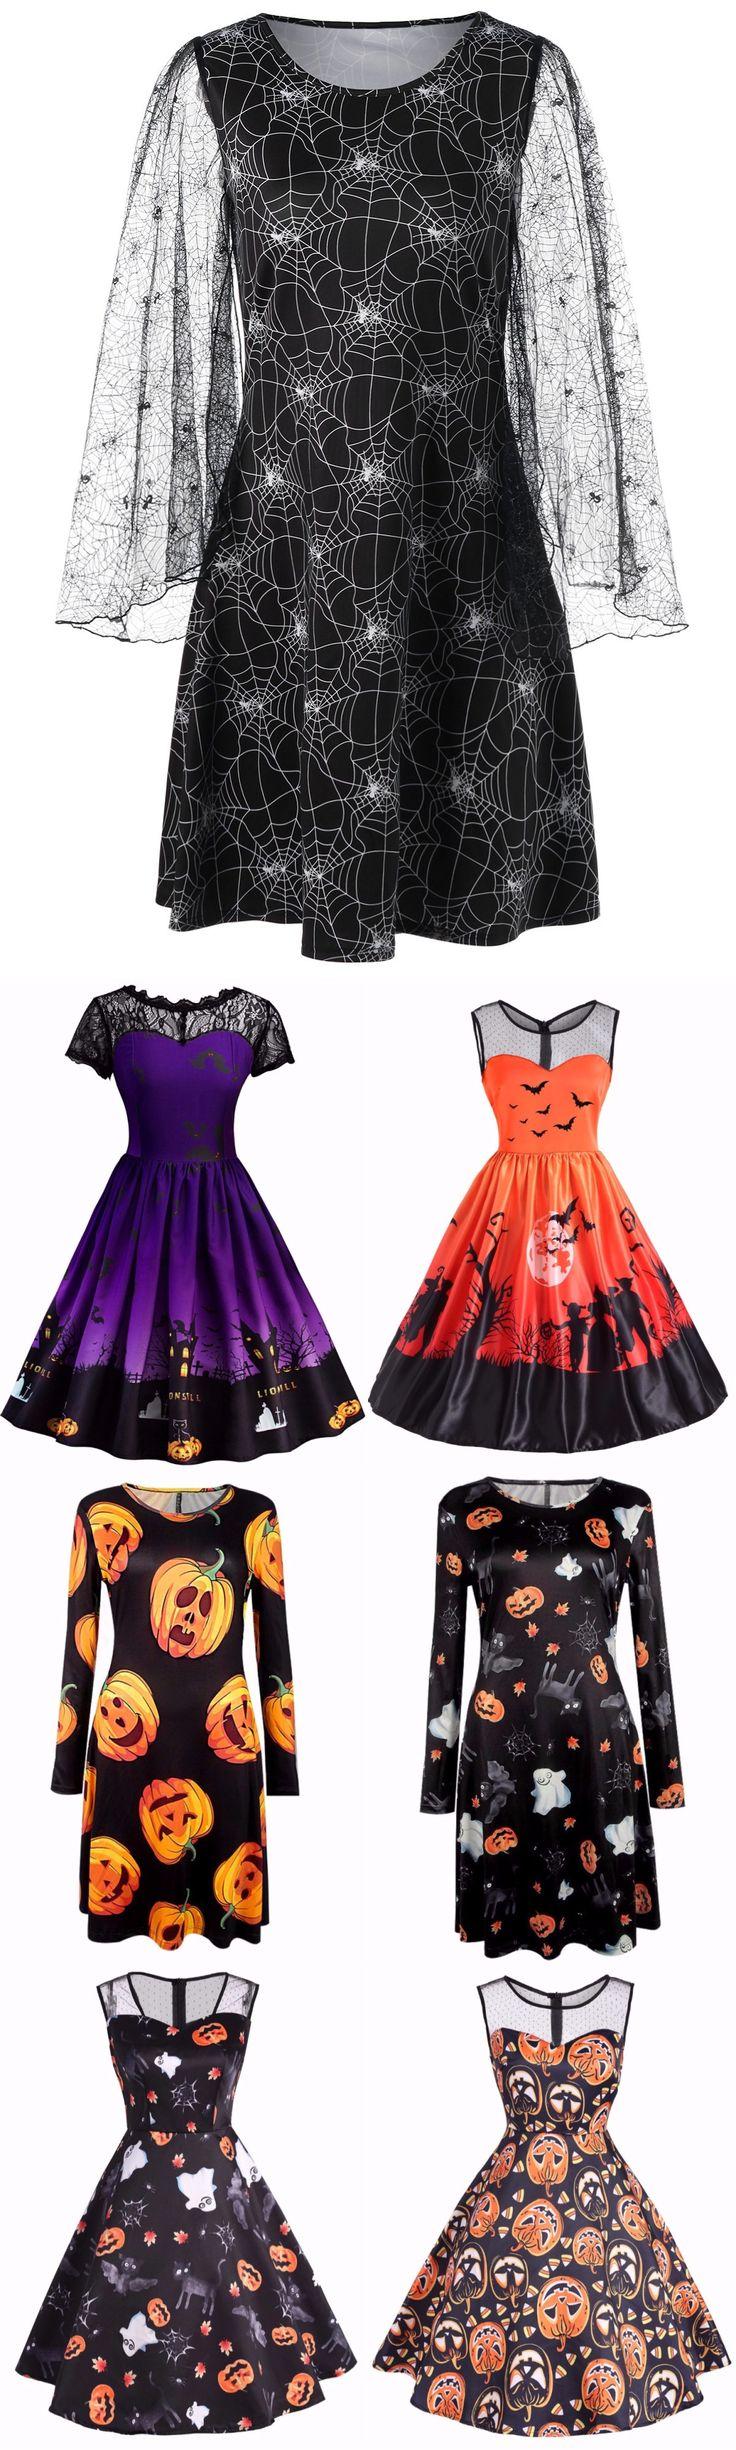 Halloween Costume Dress | Start From Only $10 | Dress Frill | Ruffle Dress | Belted Surplice | Chiffon Ruched | Mermaid Dress | Dress Geometric | Feather Dress | Purple Dress | Sammydress.com